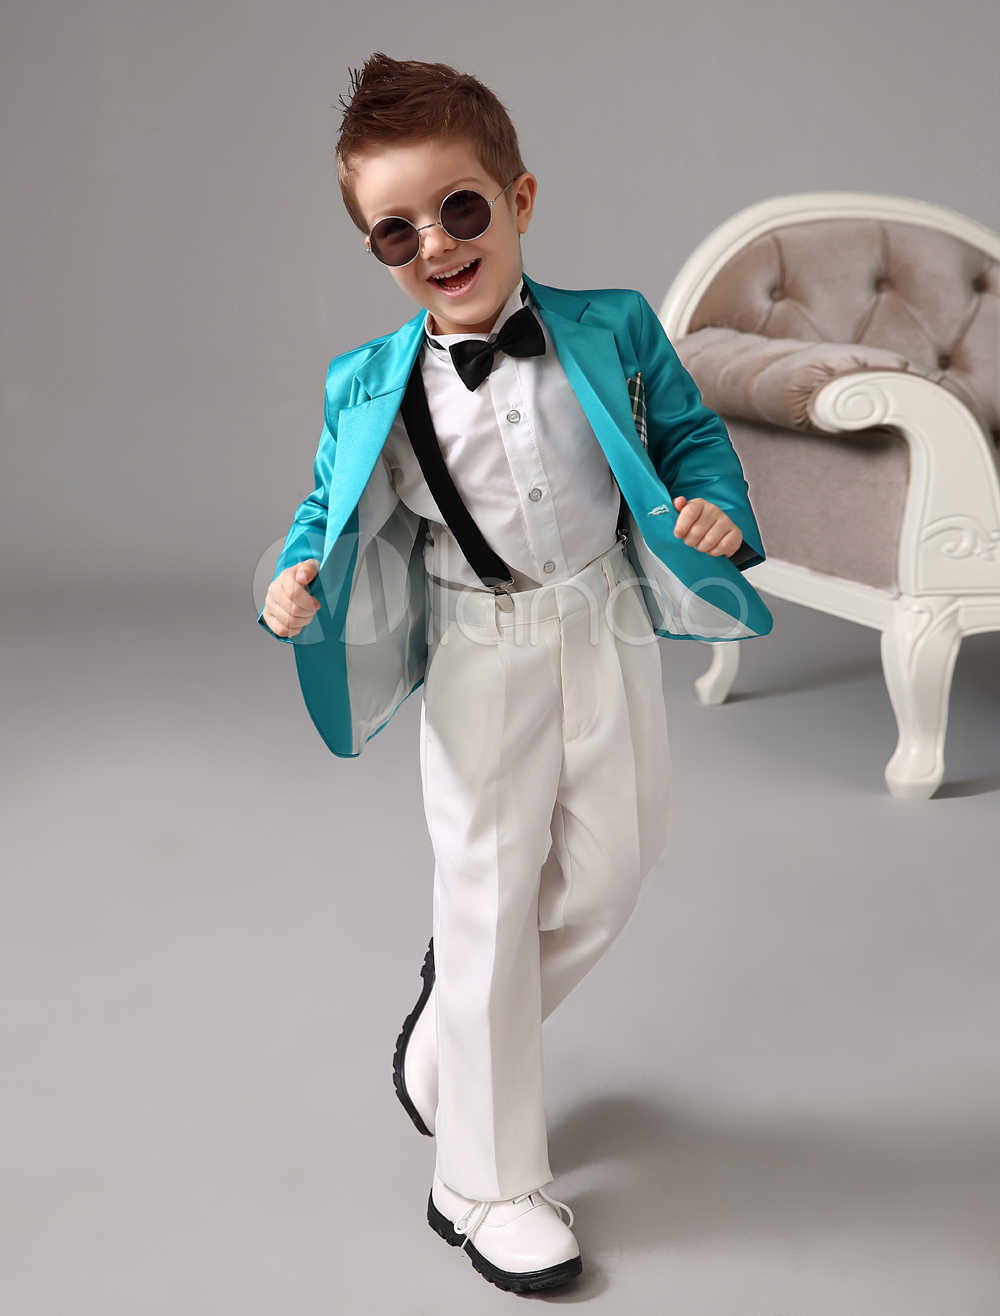 Buy Boy Suit Wedding Tuxedo Blue Jacket Pants Shirts Bow Tie Kids Formal Wear 4 Pcs Ring Bearer Suit Set for $62.99 in Milanoo store